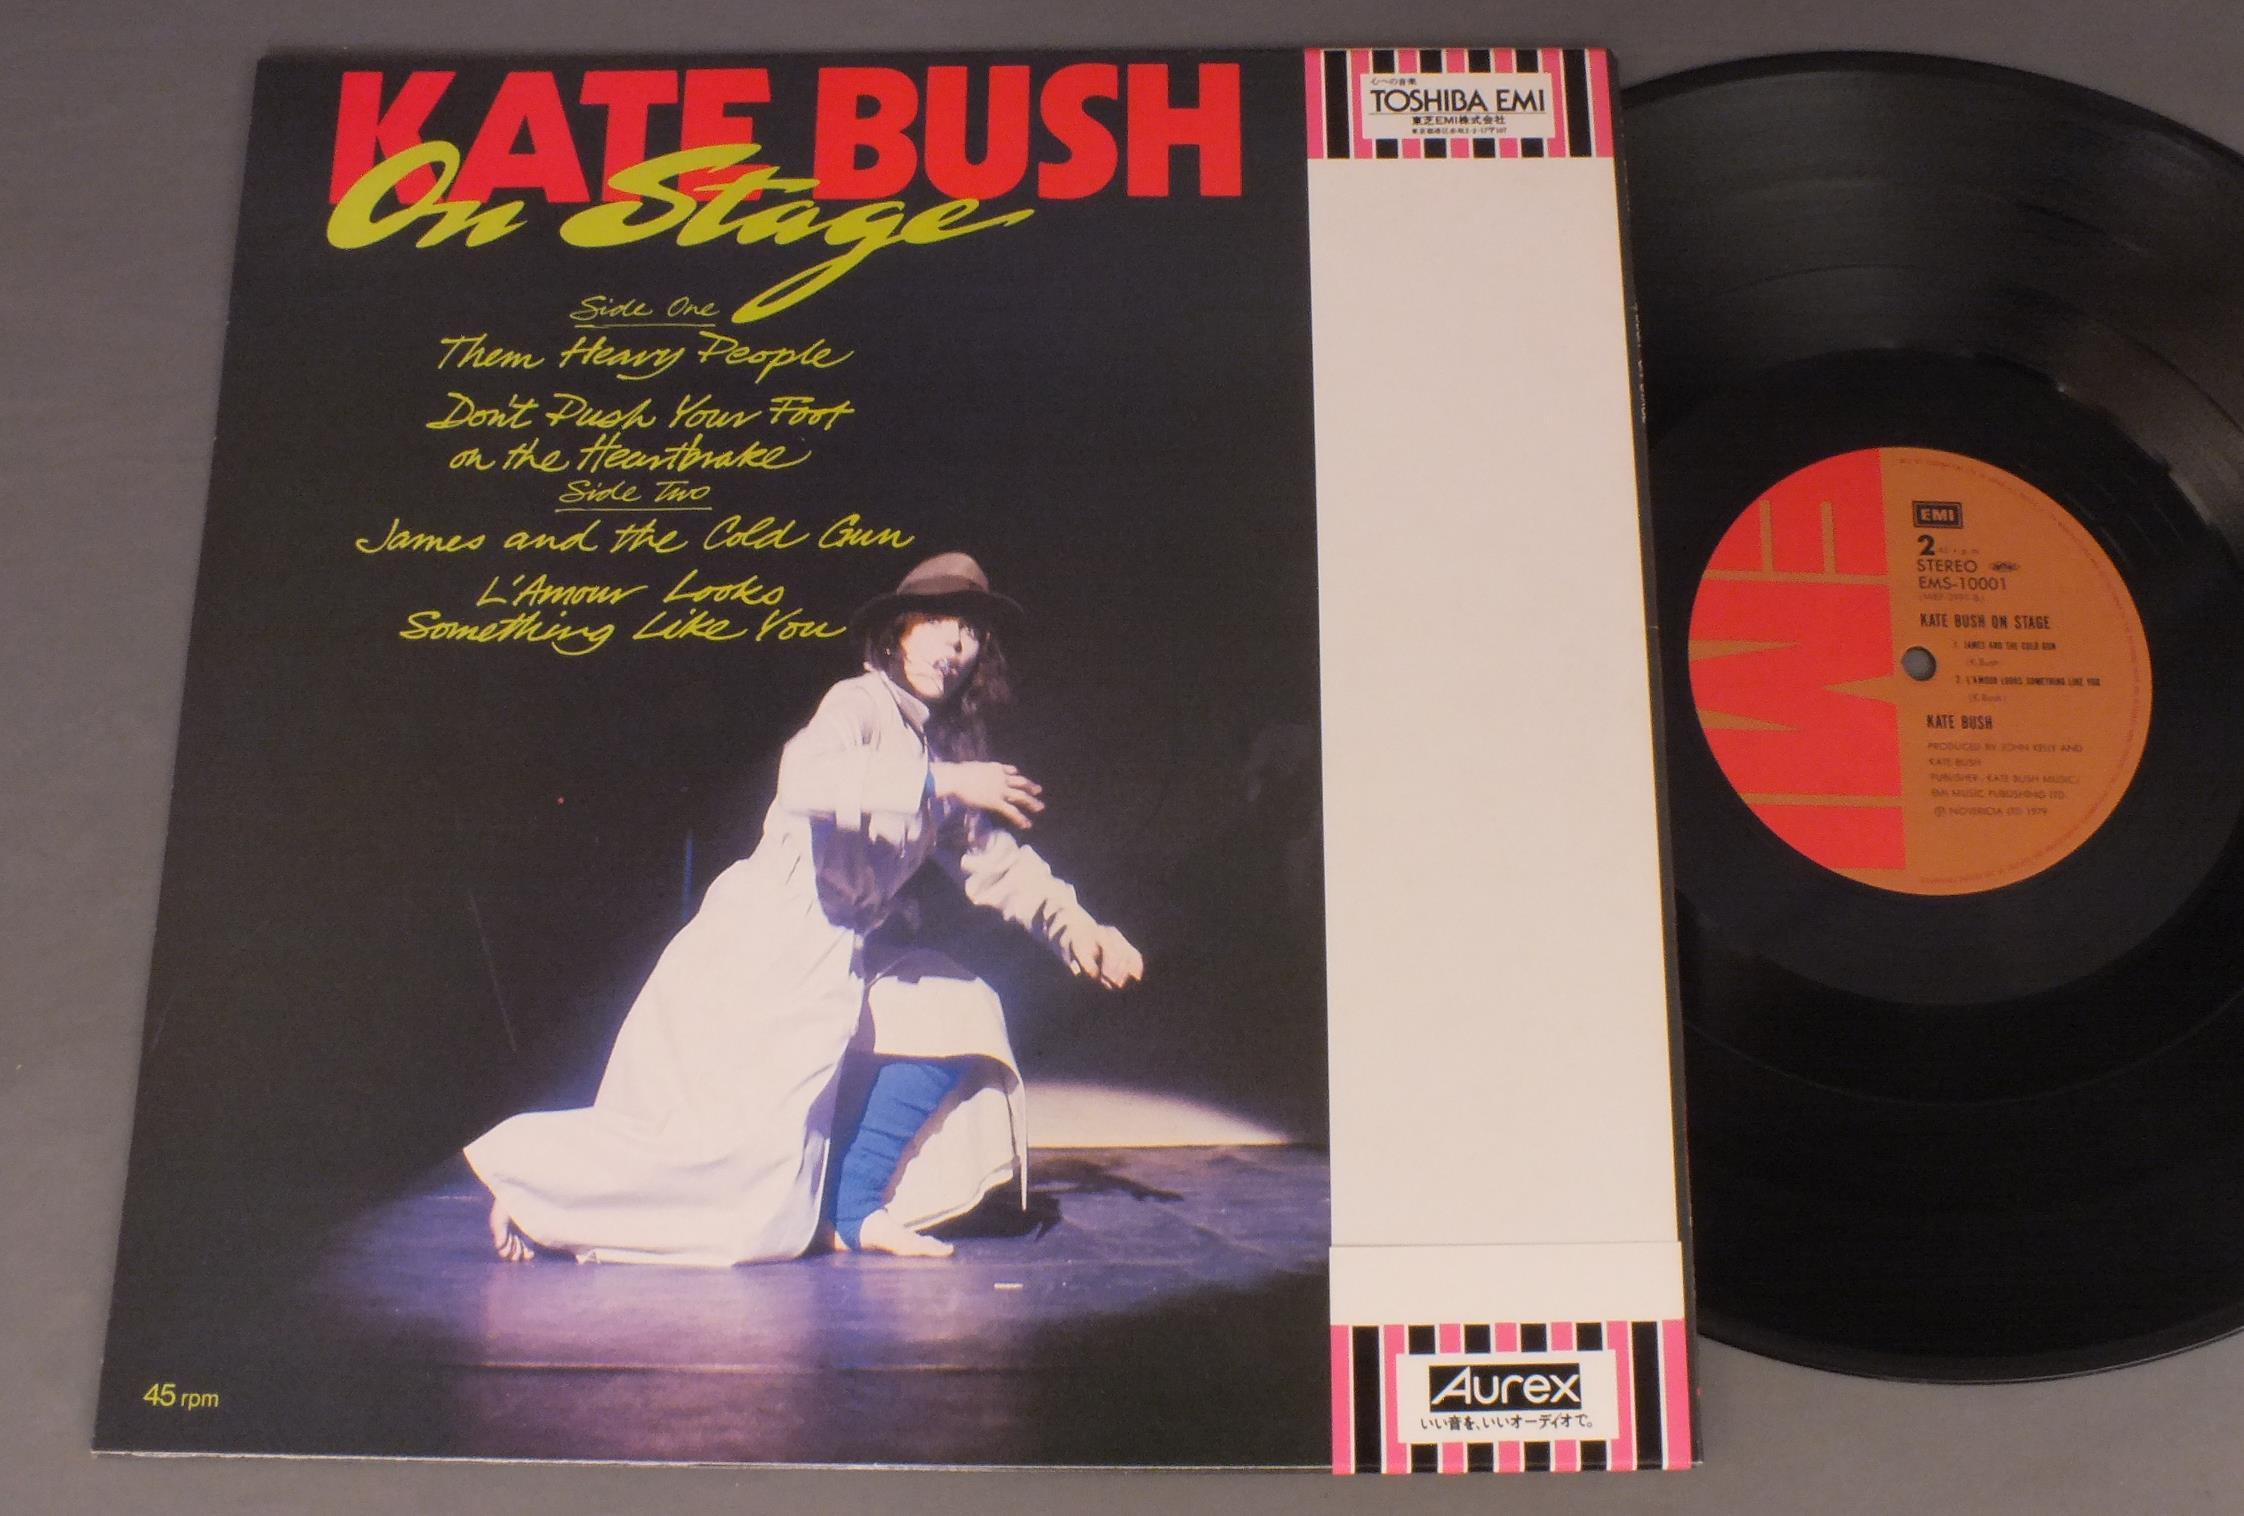 KATE BUSHケイト・ブッシュ/KATE BUSH ON STAGEミステリー(ケイト・ブッシュ・オン・ステージ) EMS10001